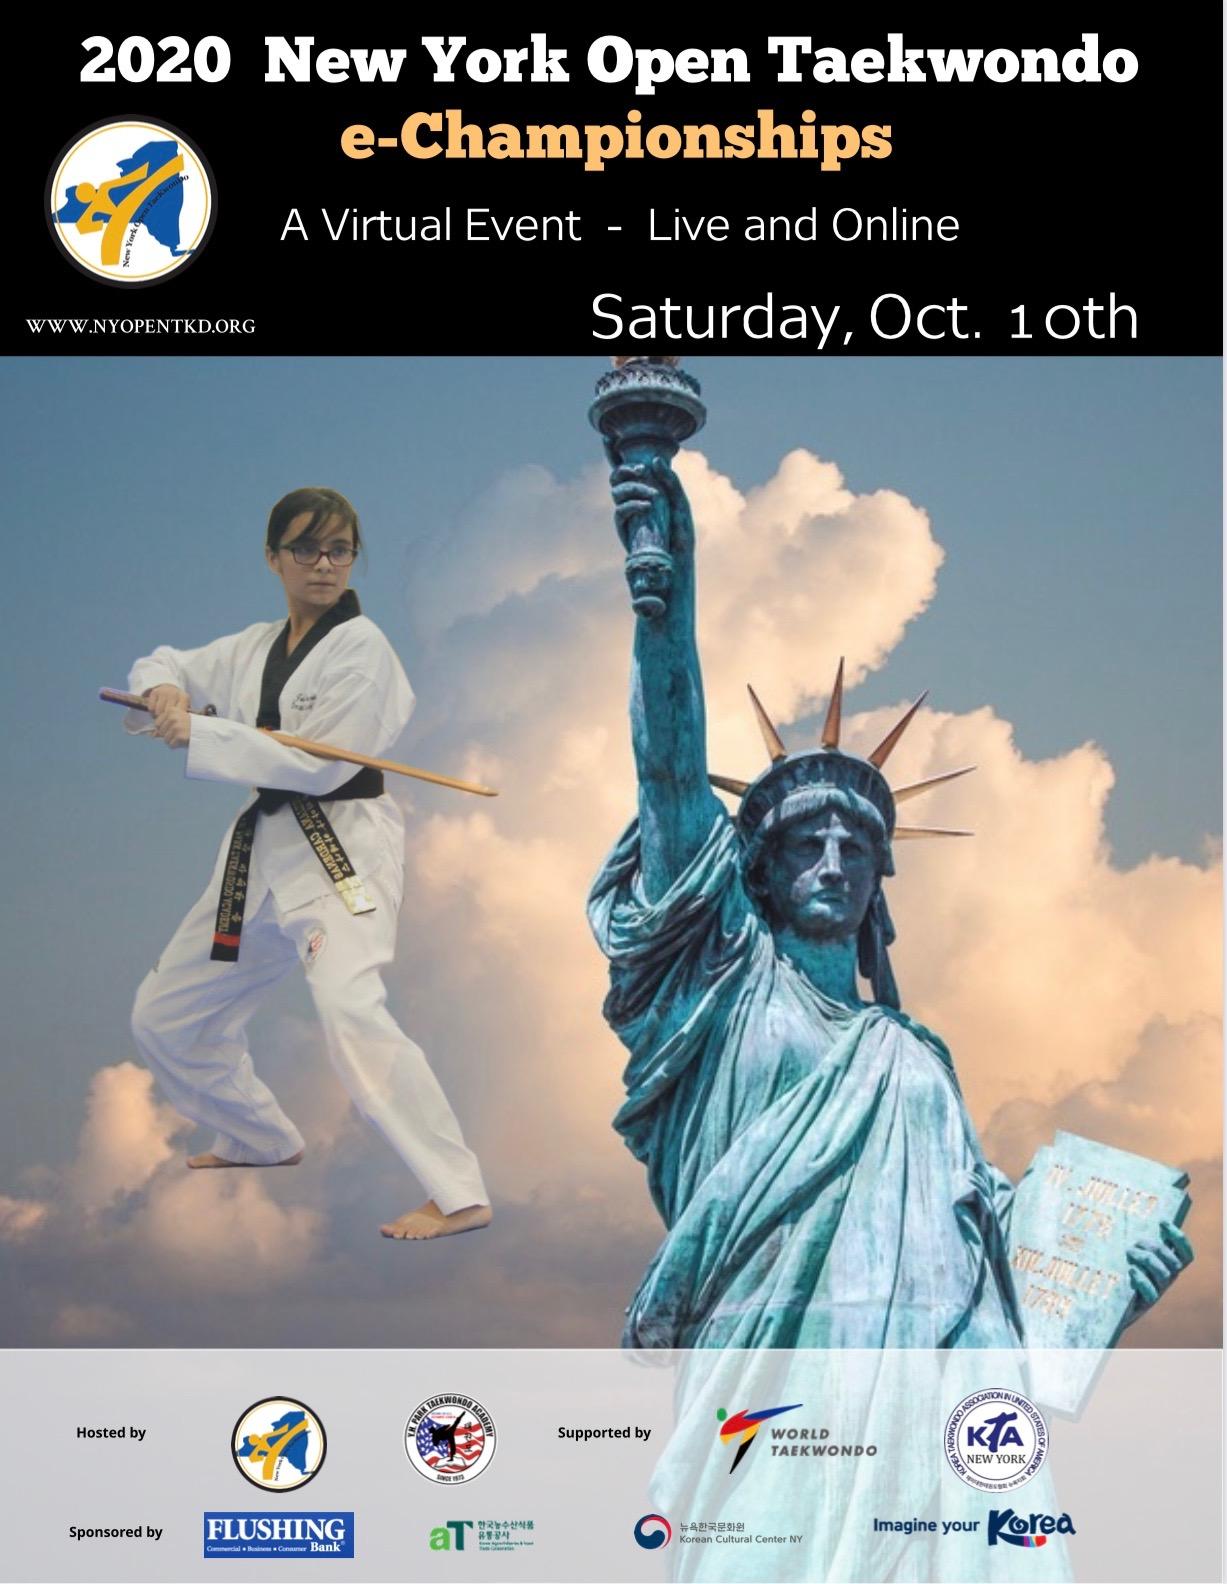 New York Open Taekwondo e-Championships